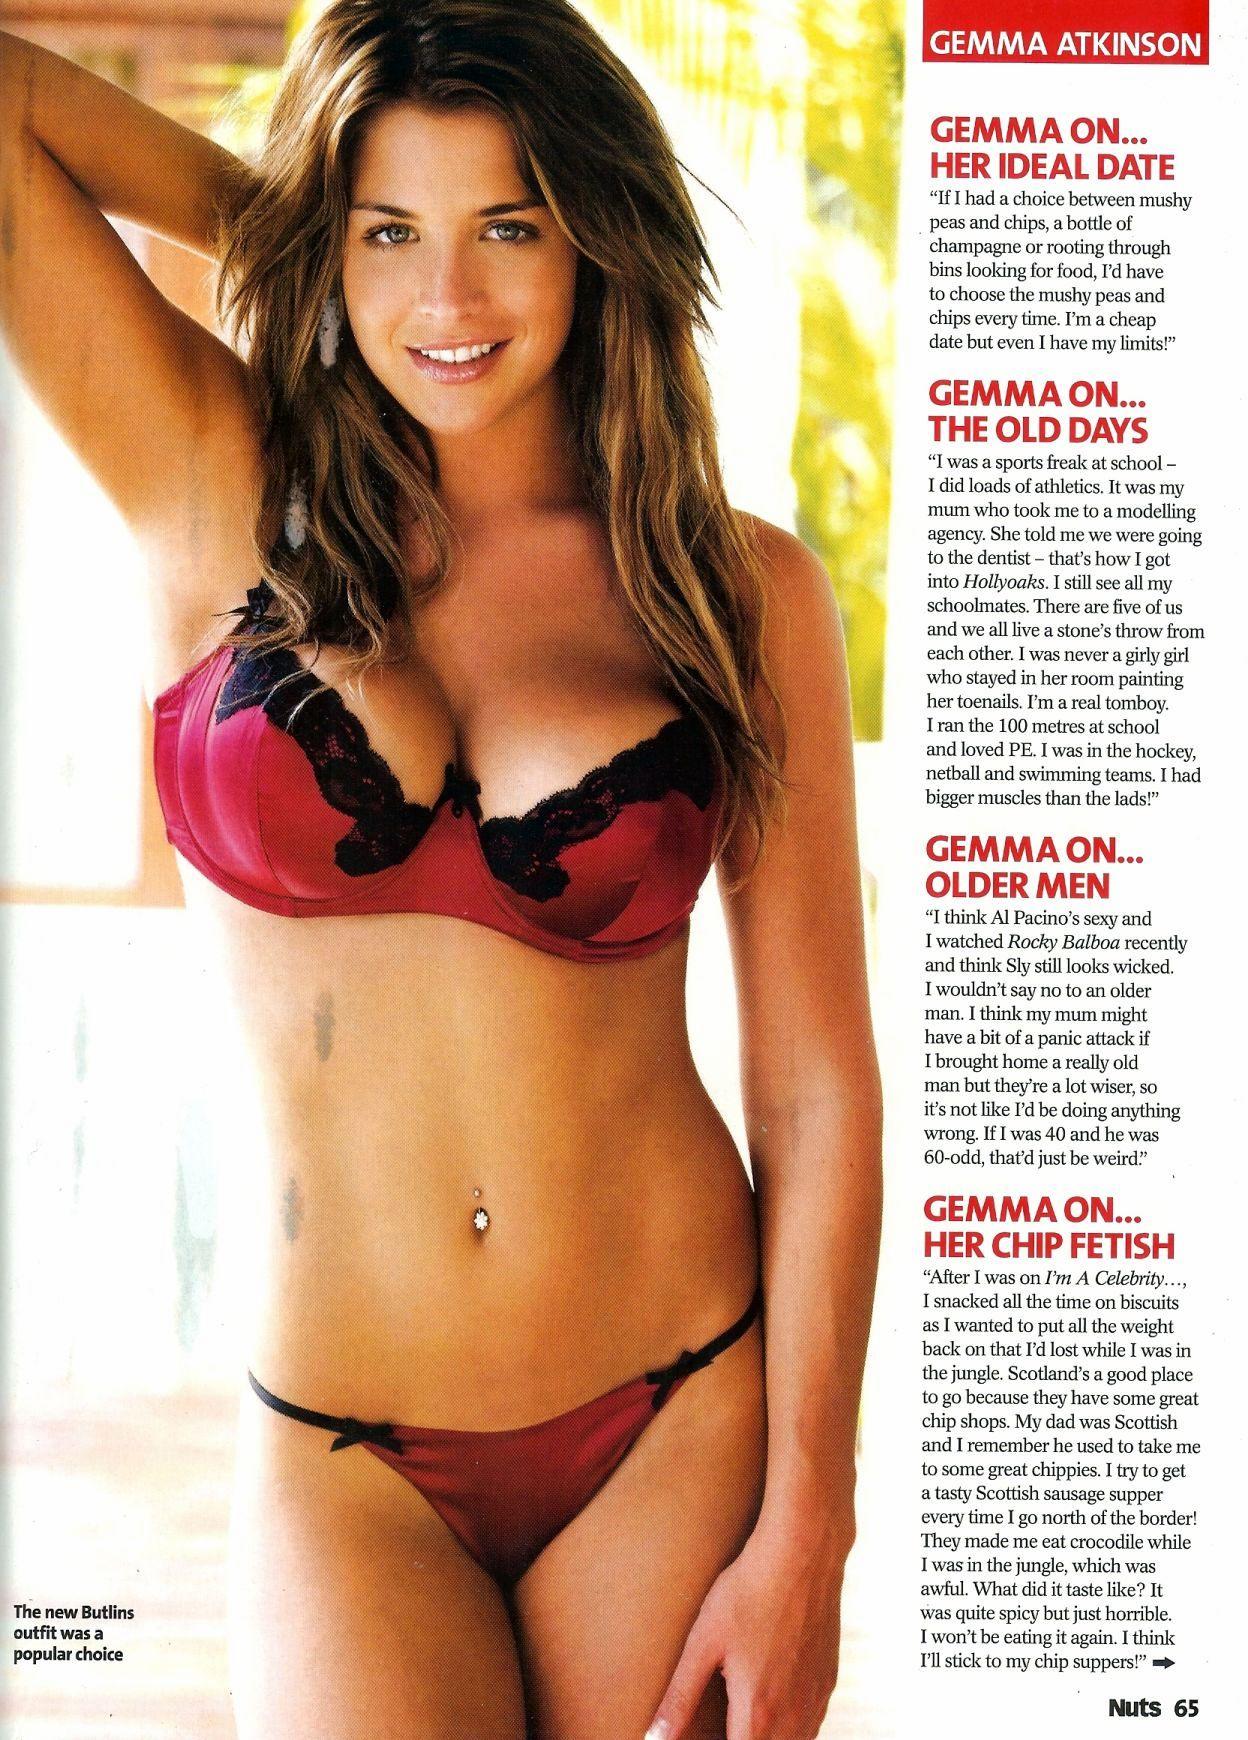 06080_Gemma_Atkinson_Nuts_magazine-5_122_1095lo.jpg